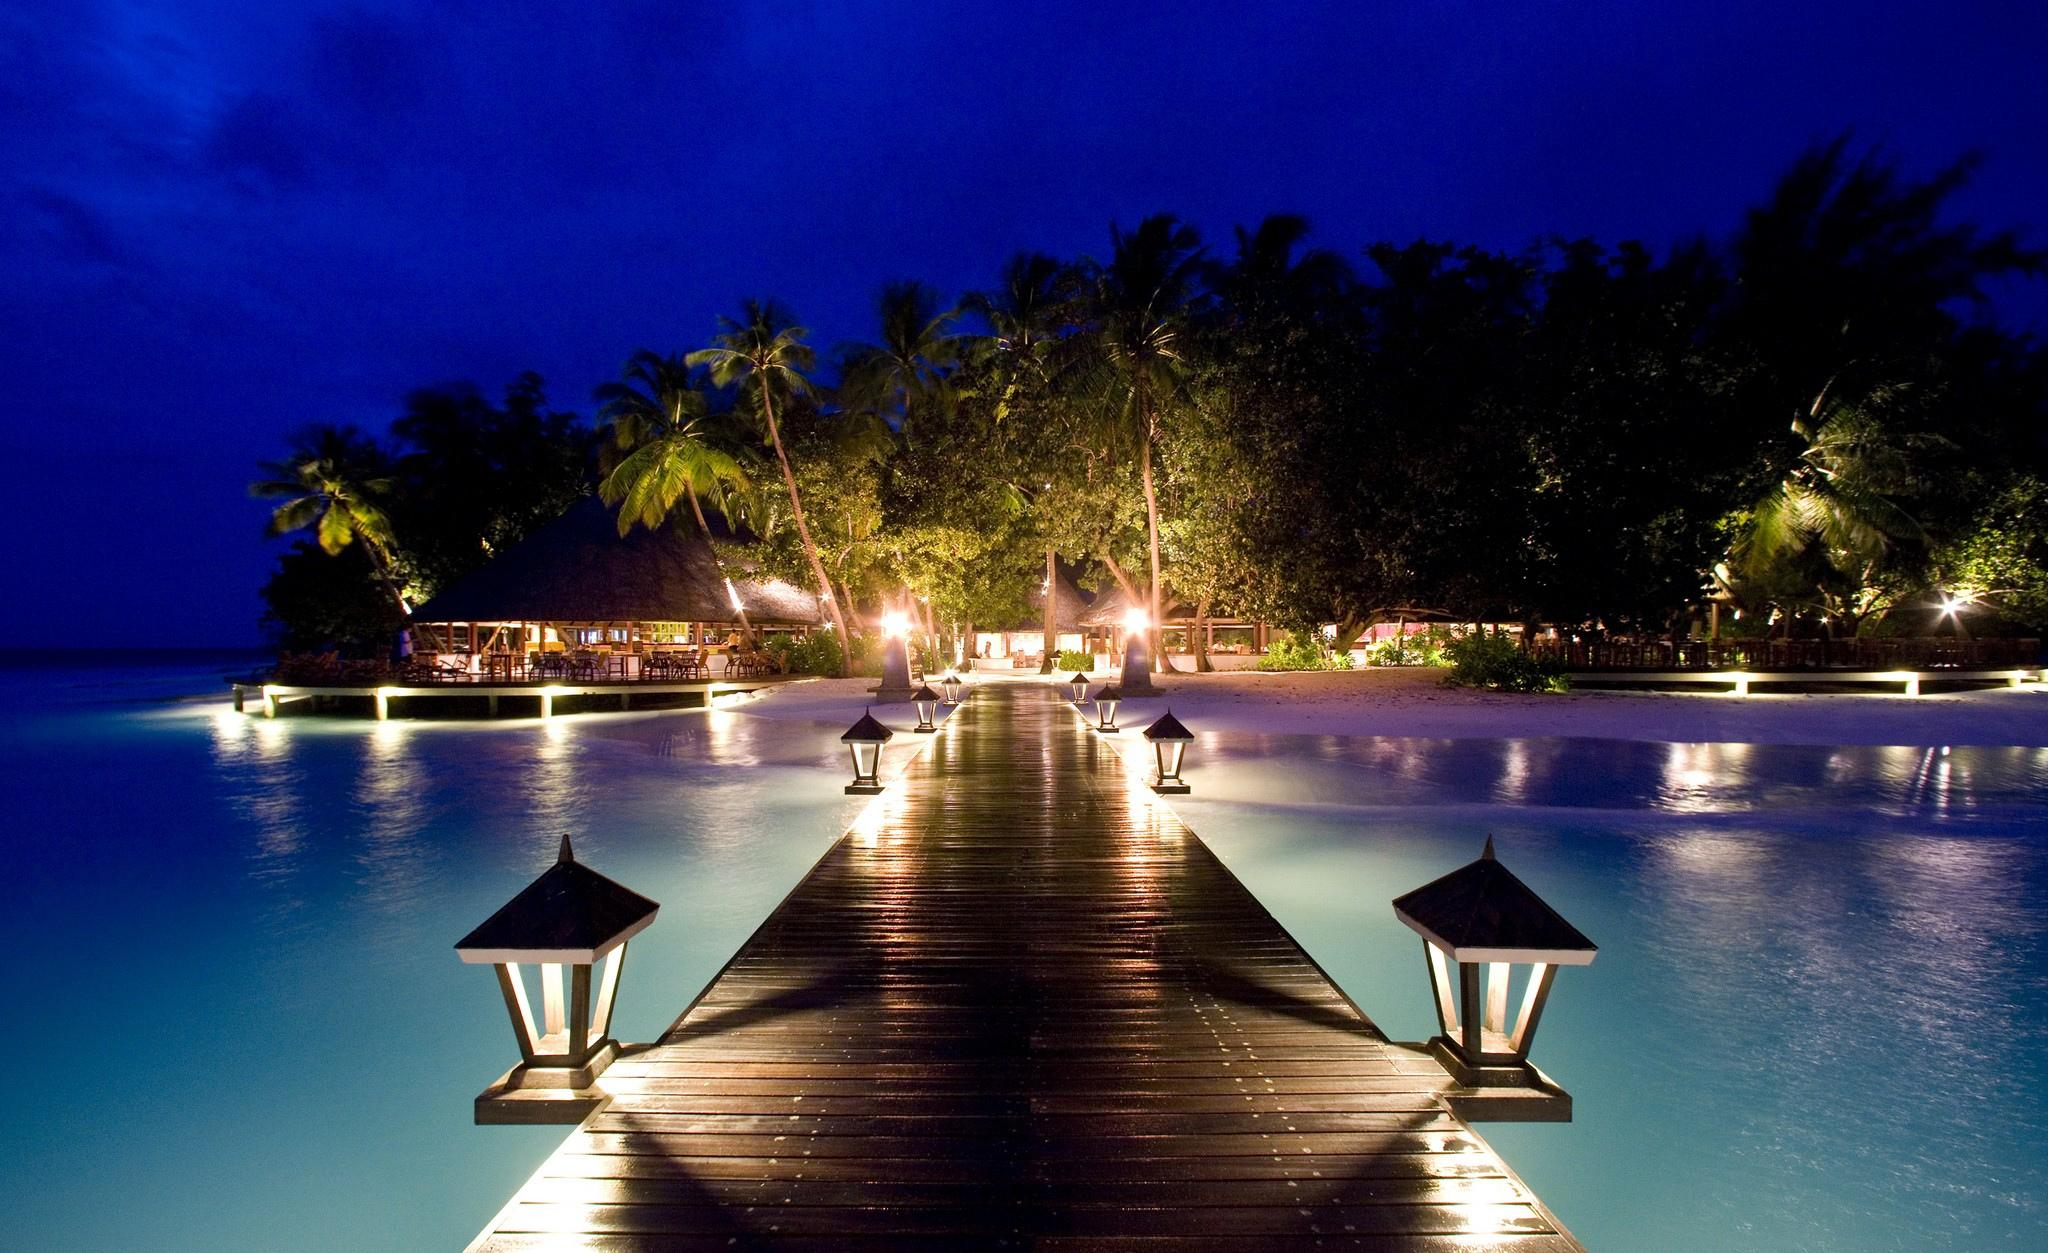 Romantic Beach at Night